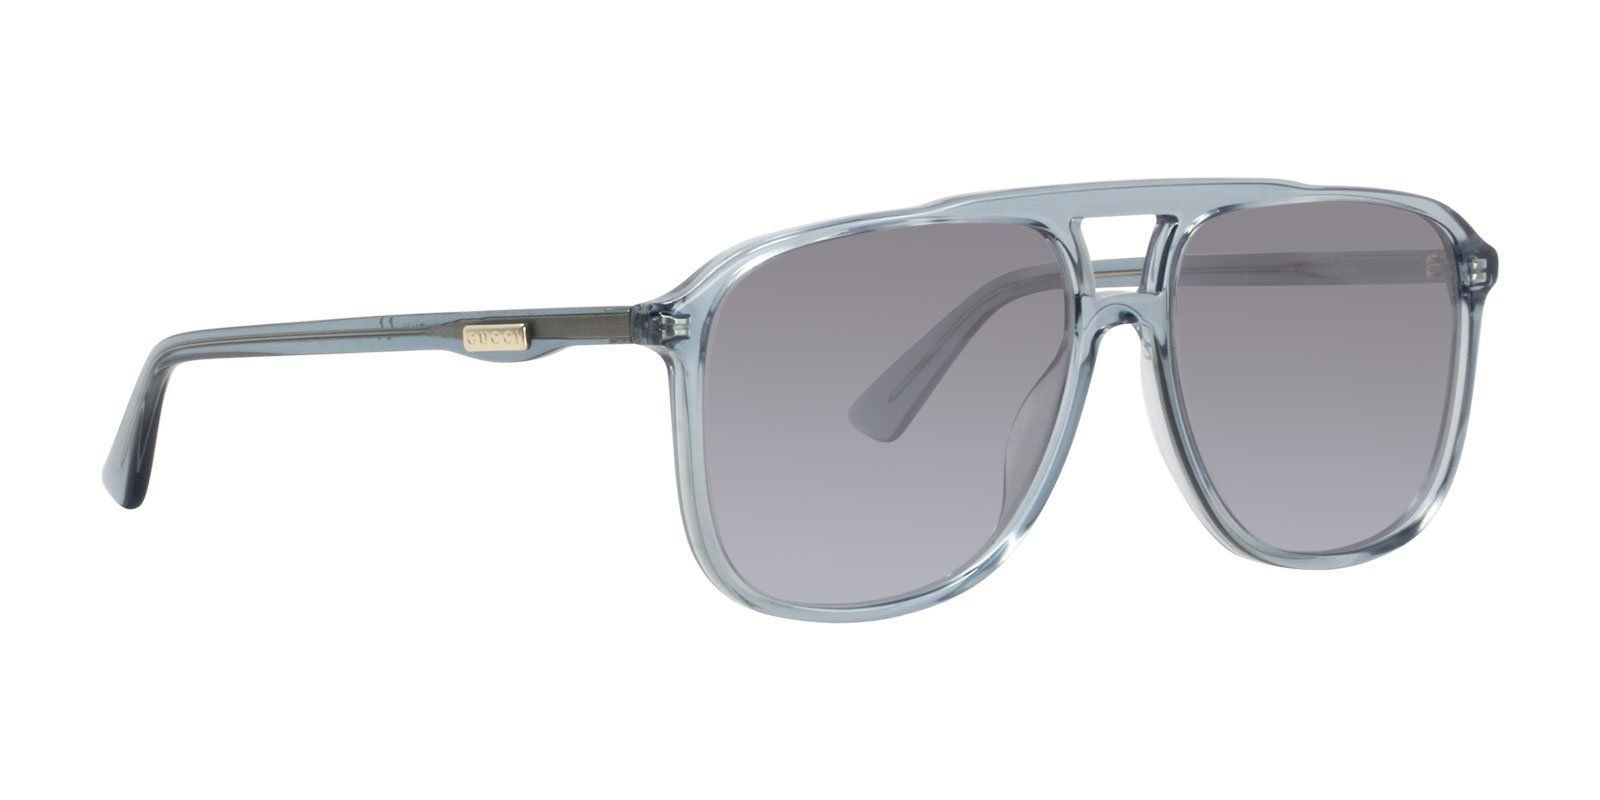 a1641097098 Gucci - GG0262S 007-sunglasses-Designer Eyes